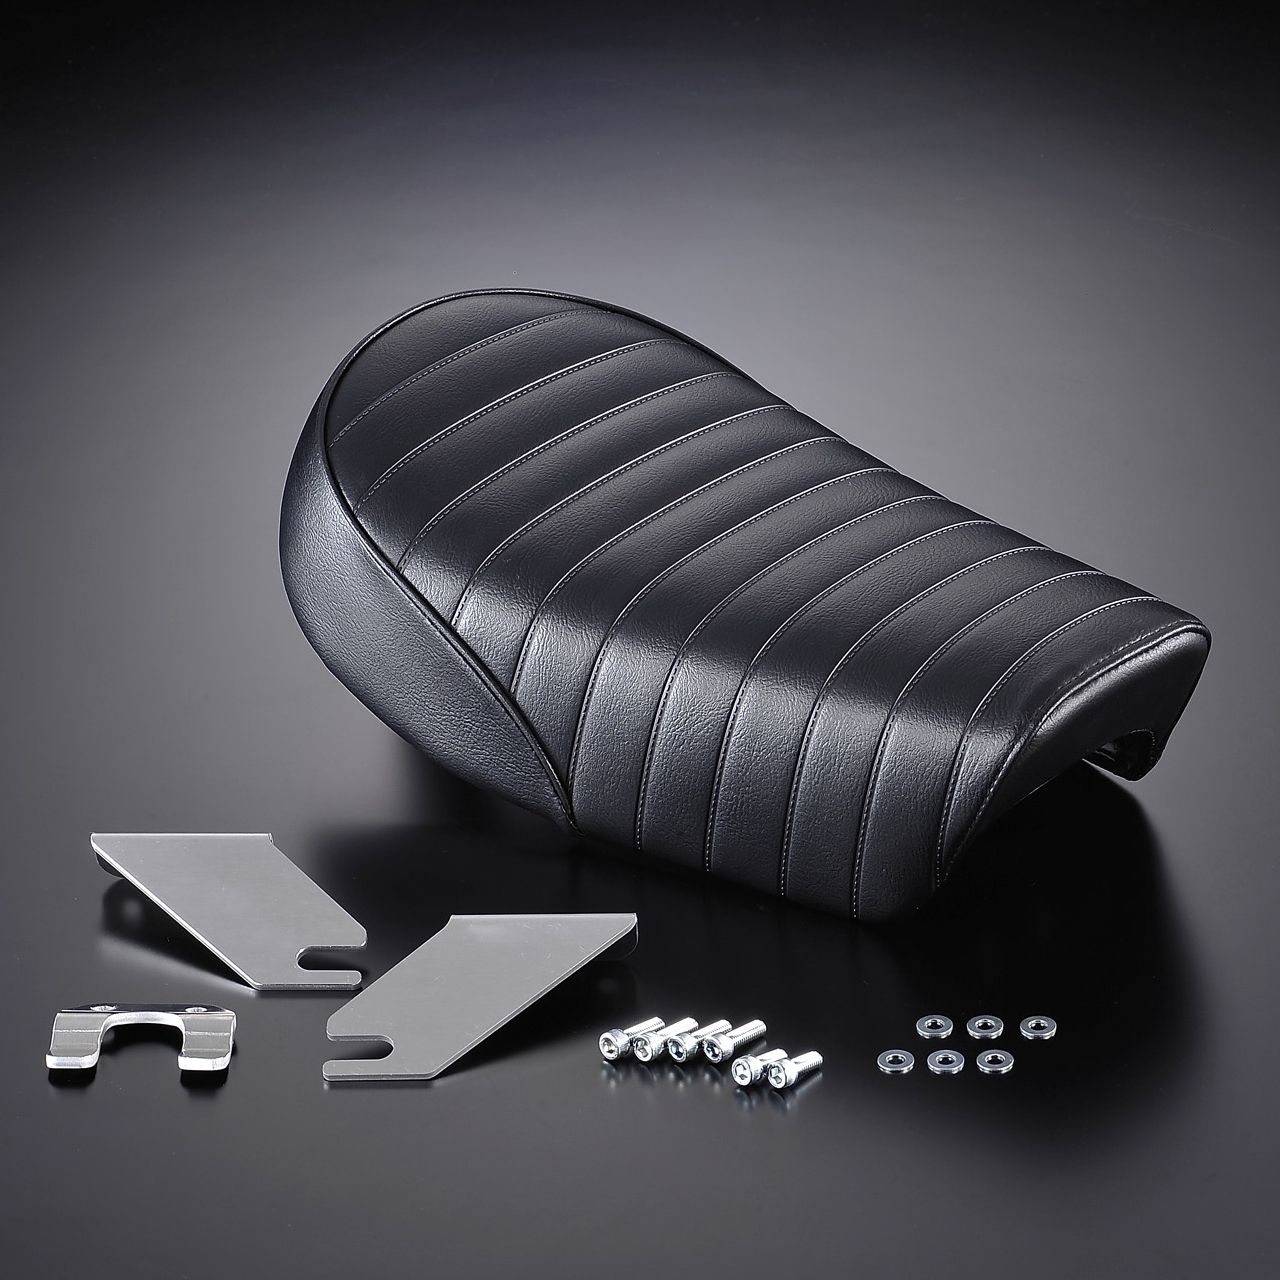 【G-Craft】Custom 坐墊 Flat Tuck Roll Type - 「Webike-摩托百貨」